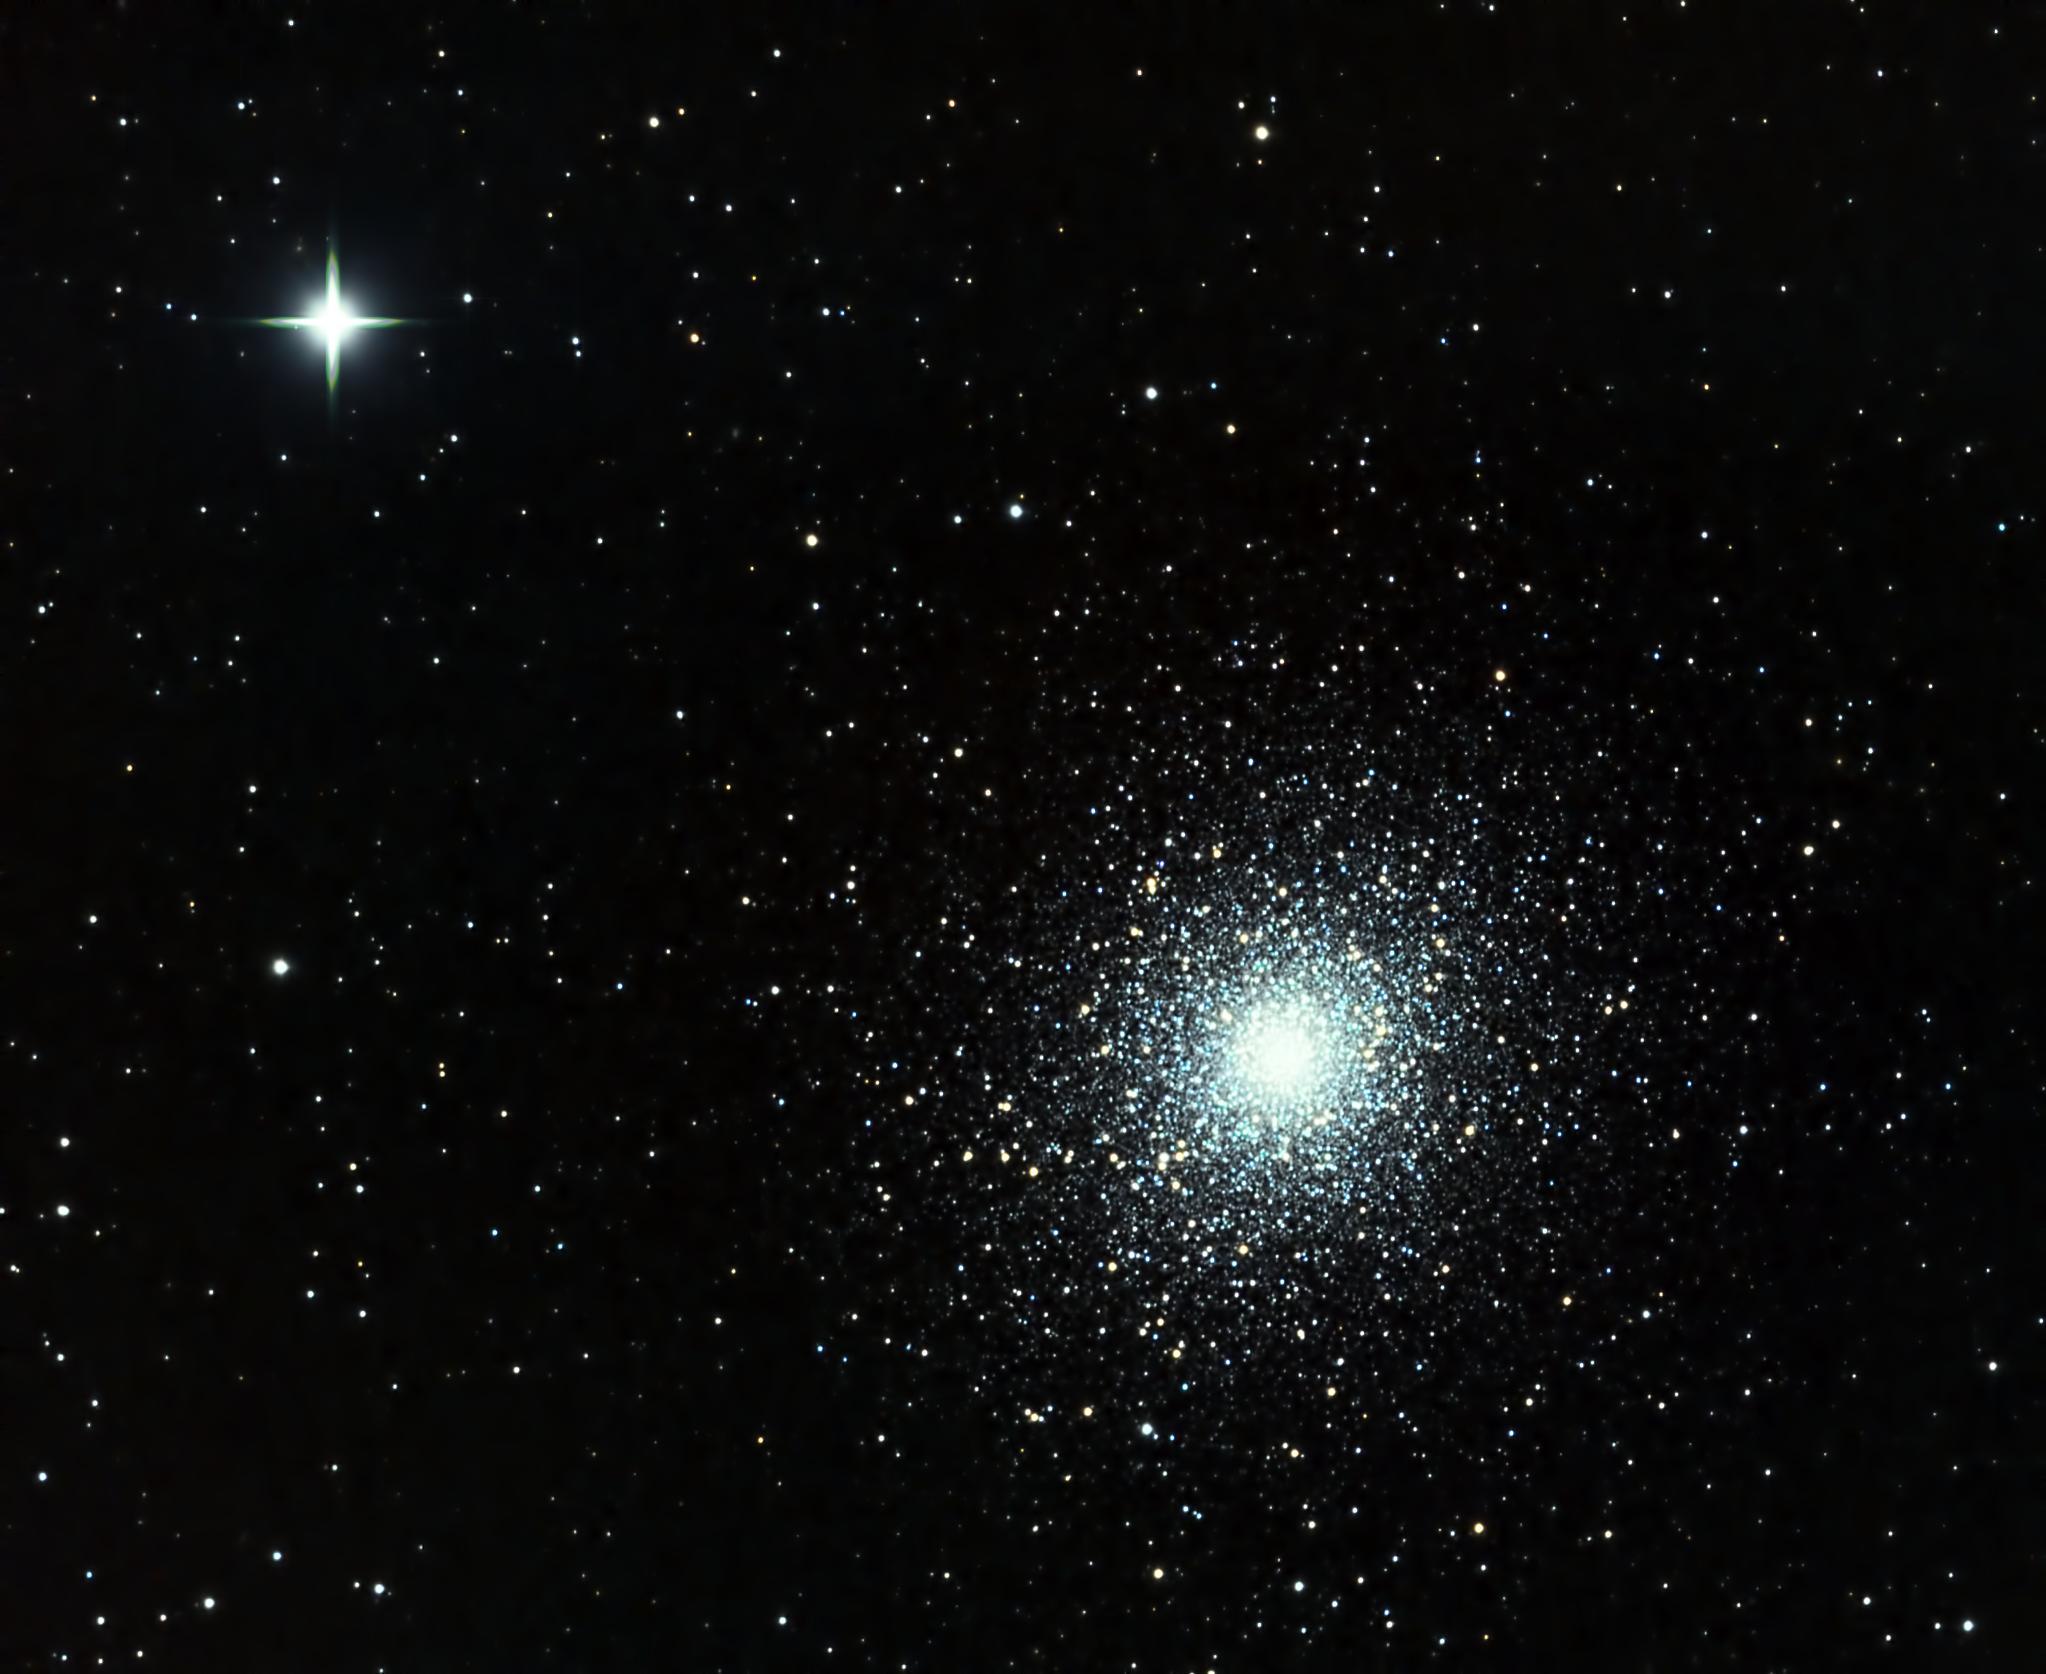 Globular Cluster M5